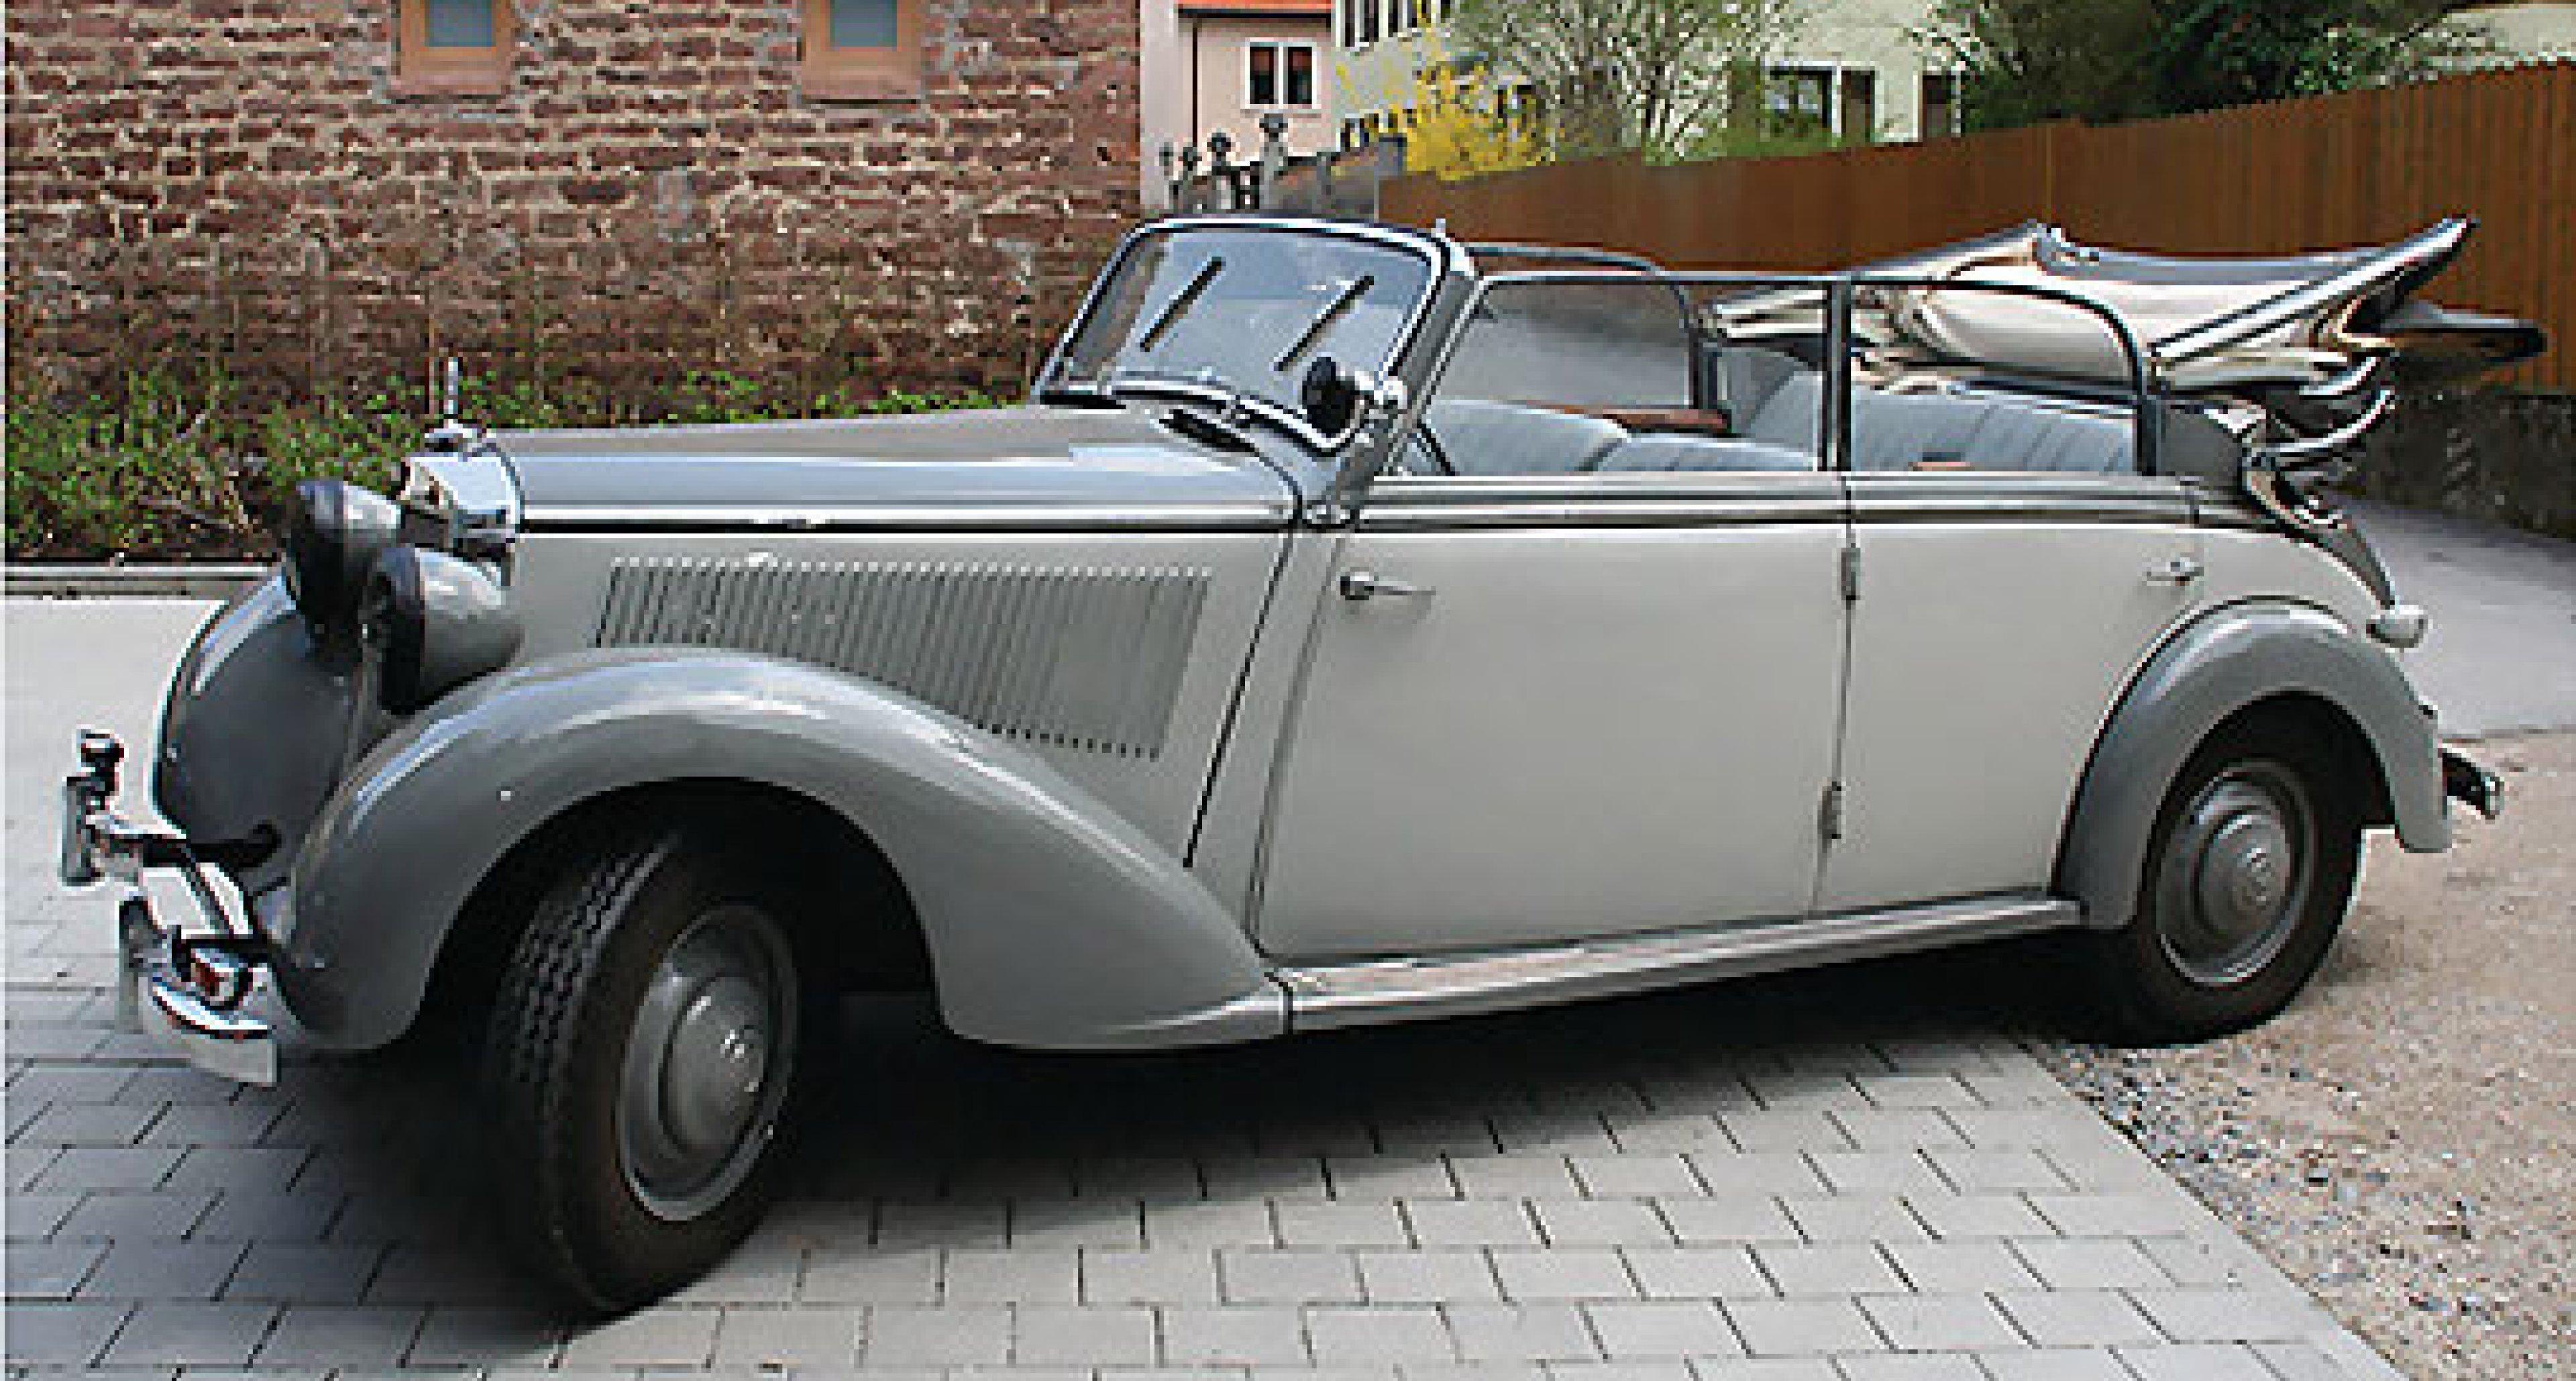 Seidel Automobilia Auktion Ladenburg 2006 - Vorschau